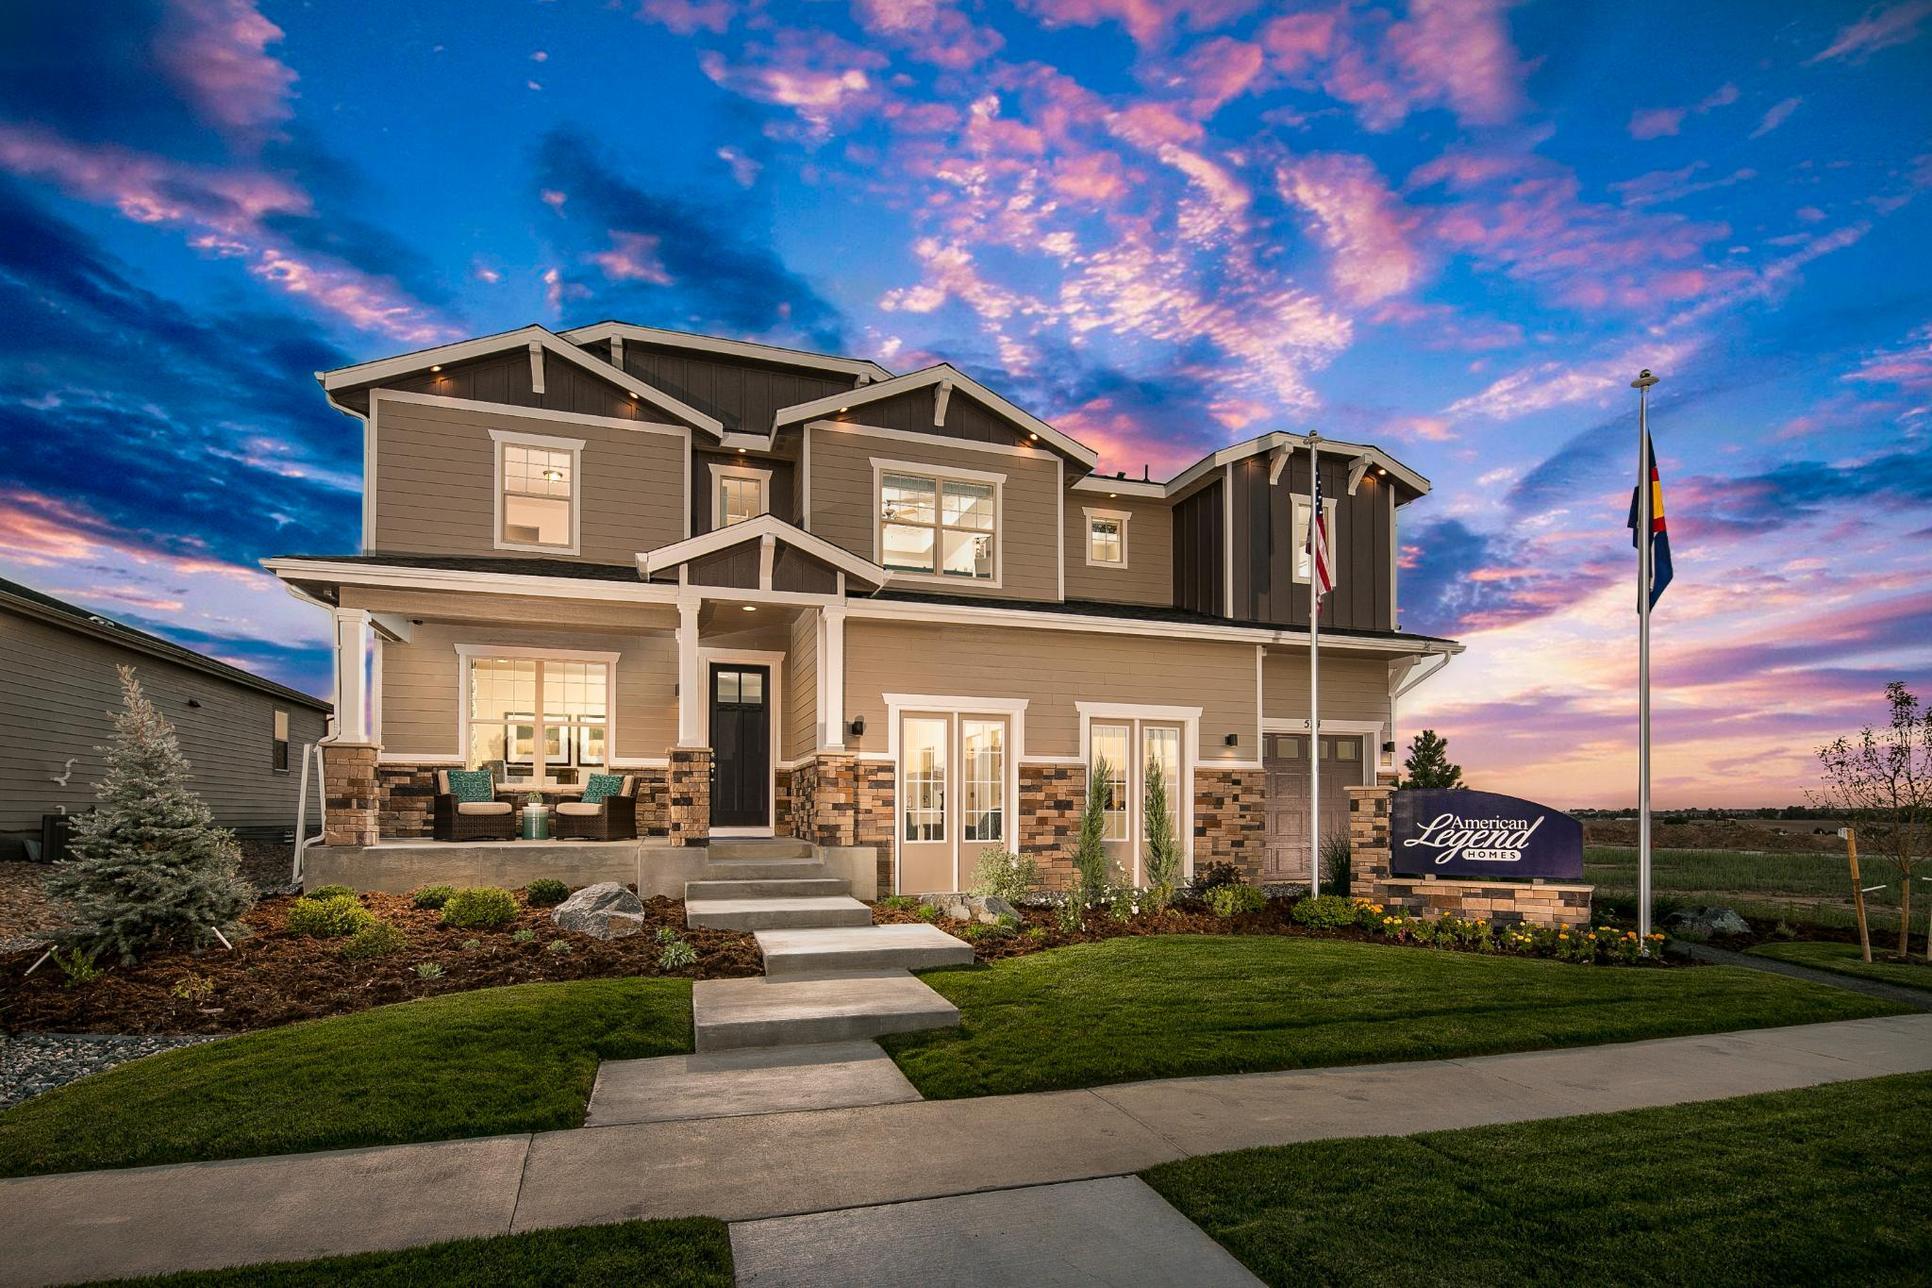 Heritage Ridge Plan C505 Twilight Photo Front Elevation by American Legend Homes